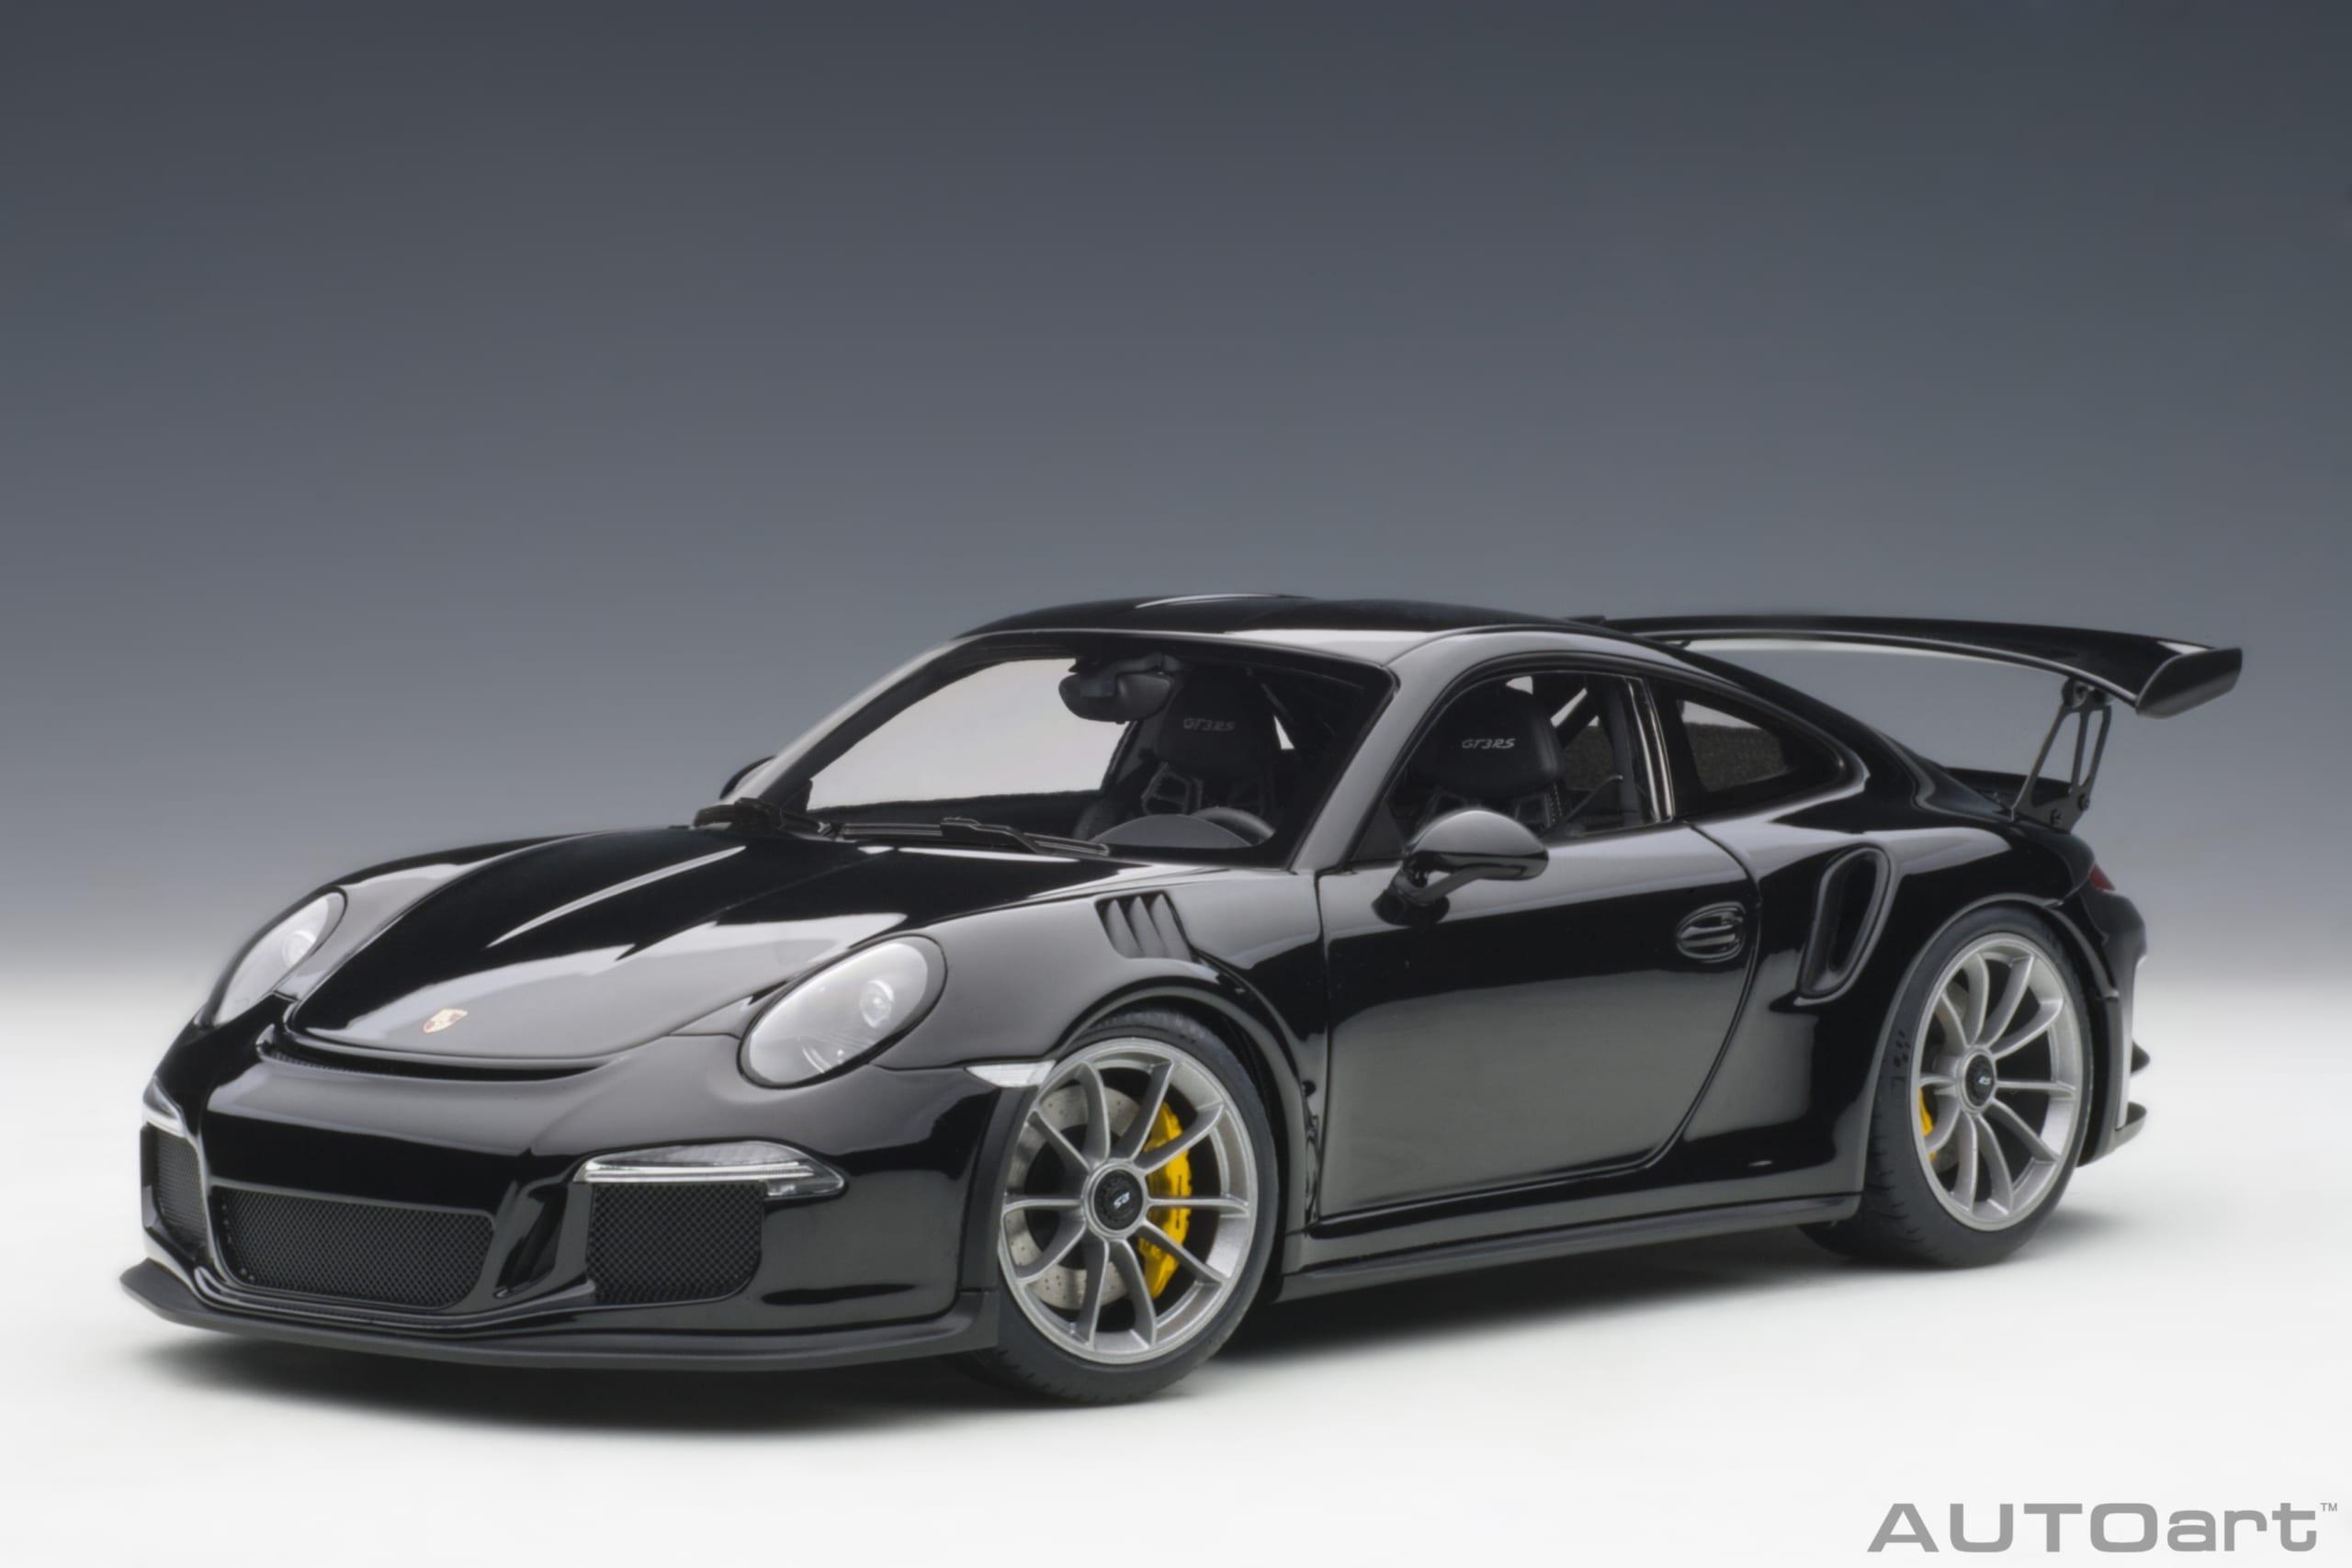 Porsche 911 991 Gt3 Rs Black Autoart